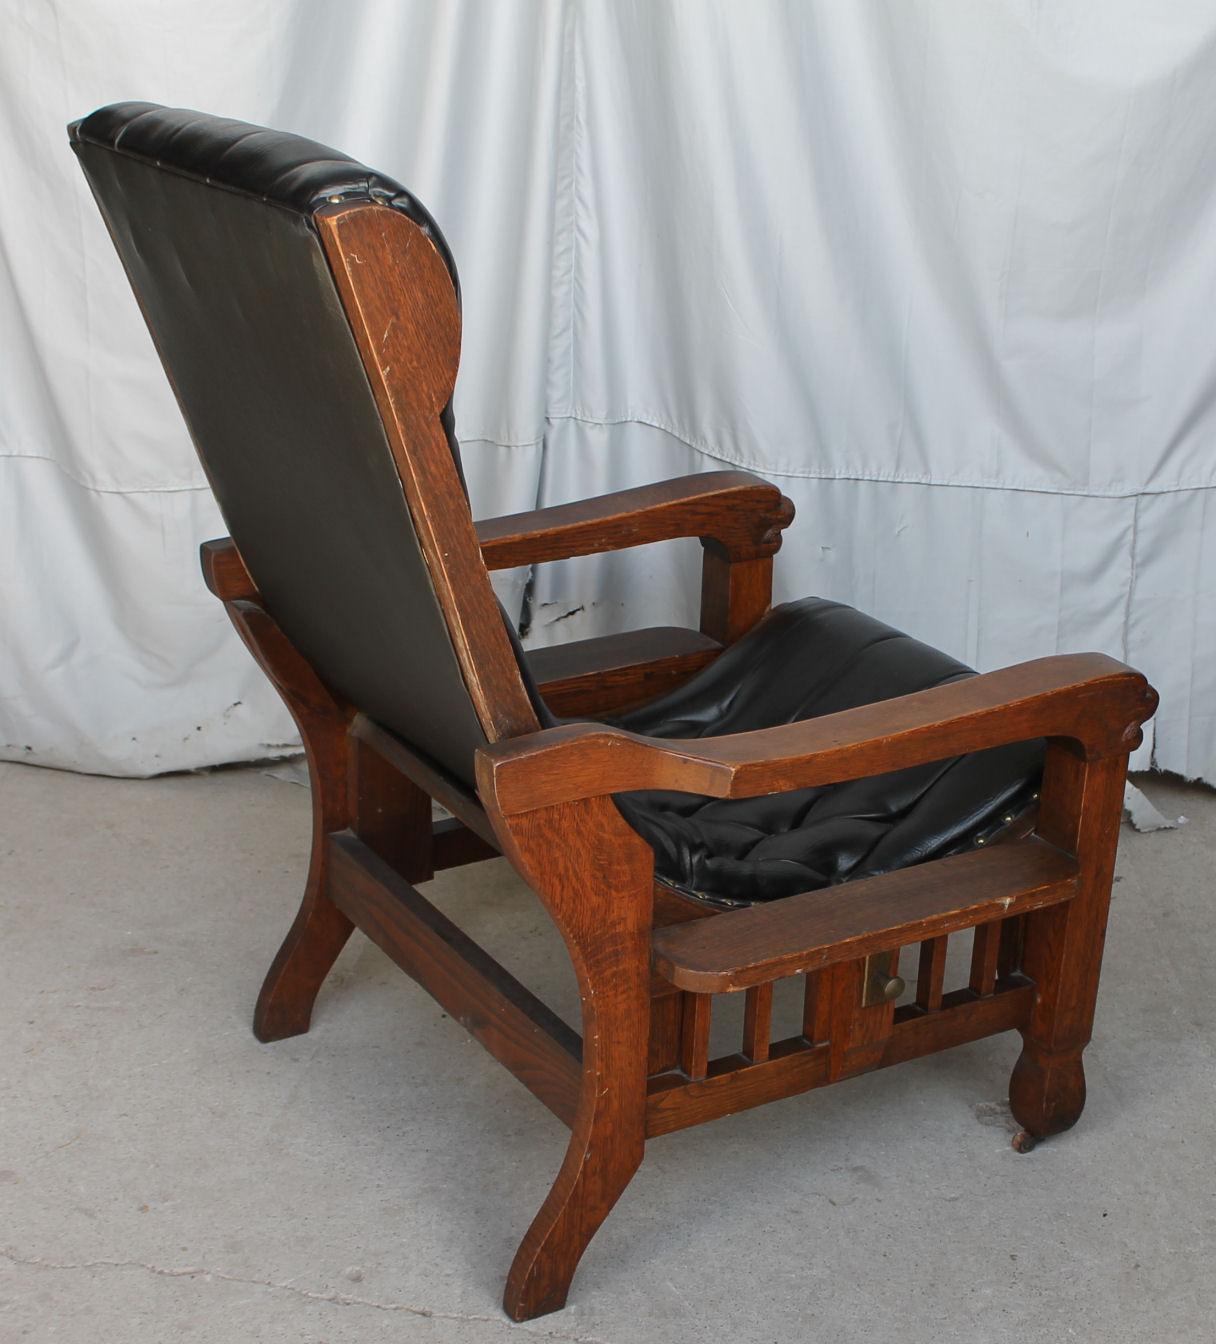 Bargain Johns Antiques  Rare Oak Morris Chair  unusual